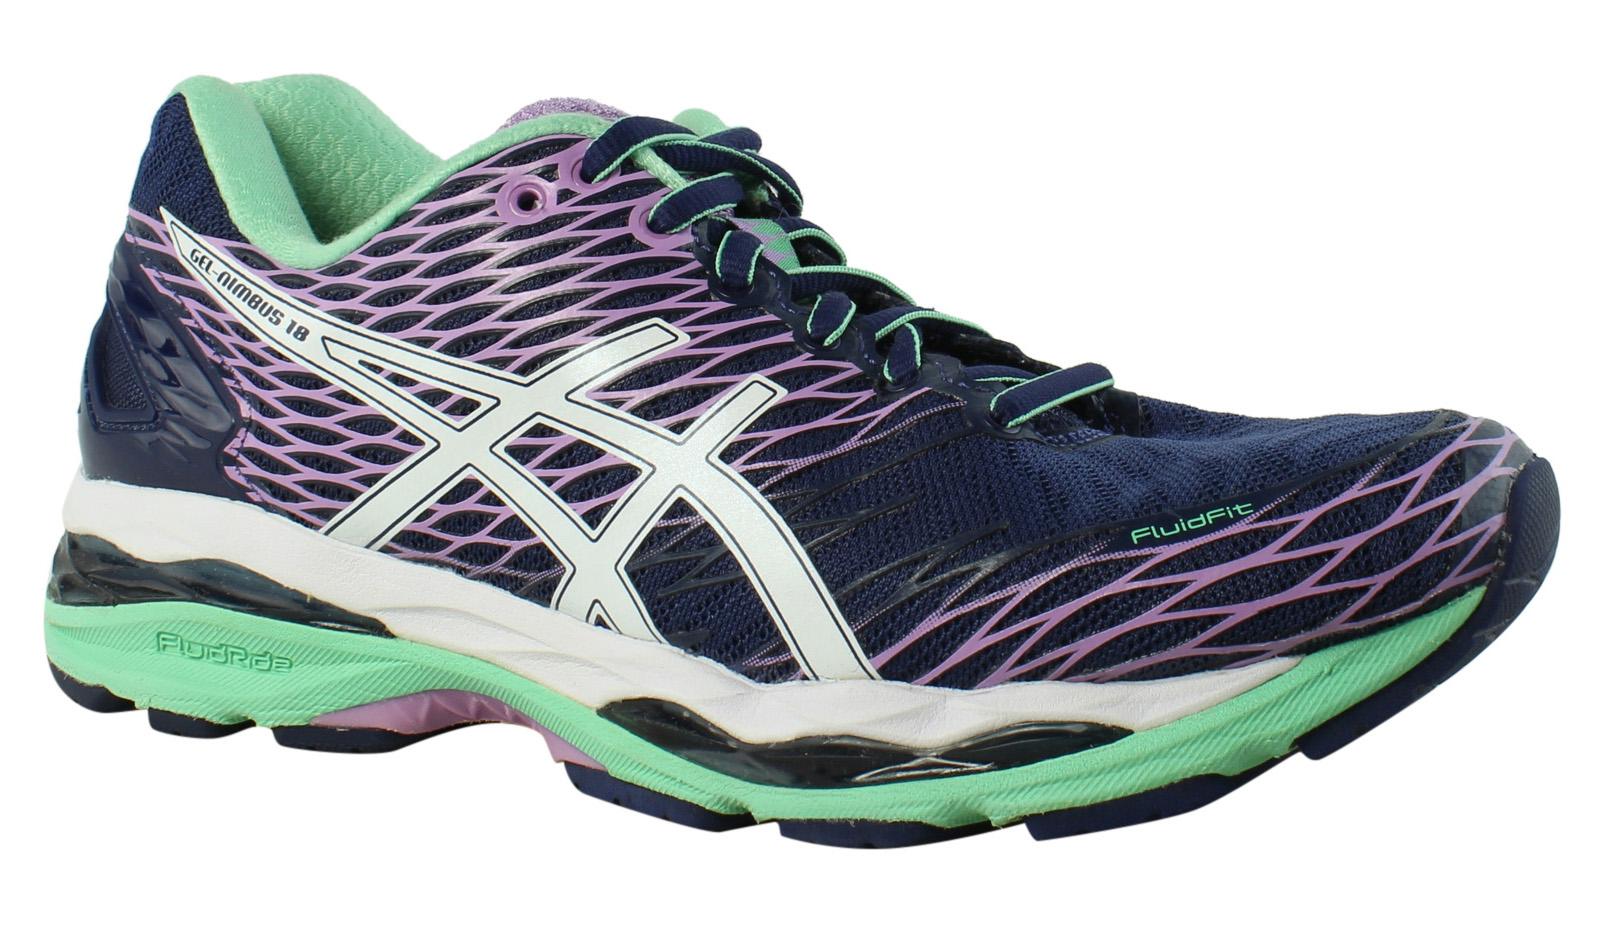 ASICS Damenschuhe - Blau Running Schuhes Größe 8 (351930)